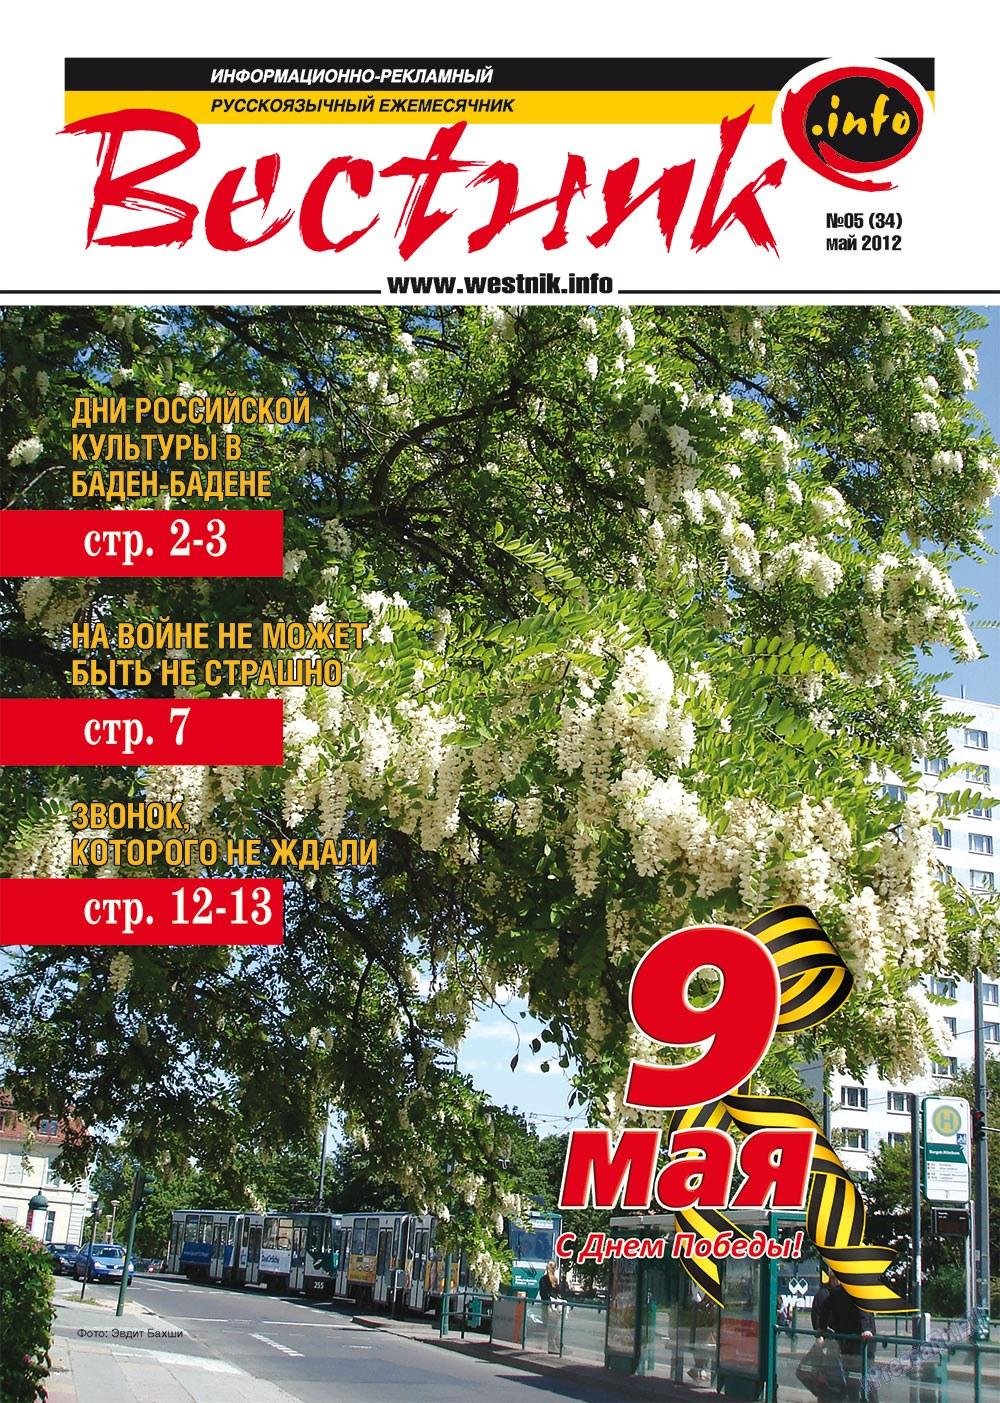 Вестник-info (журнал). 2012 год, номер 5, стр. 1